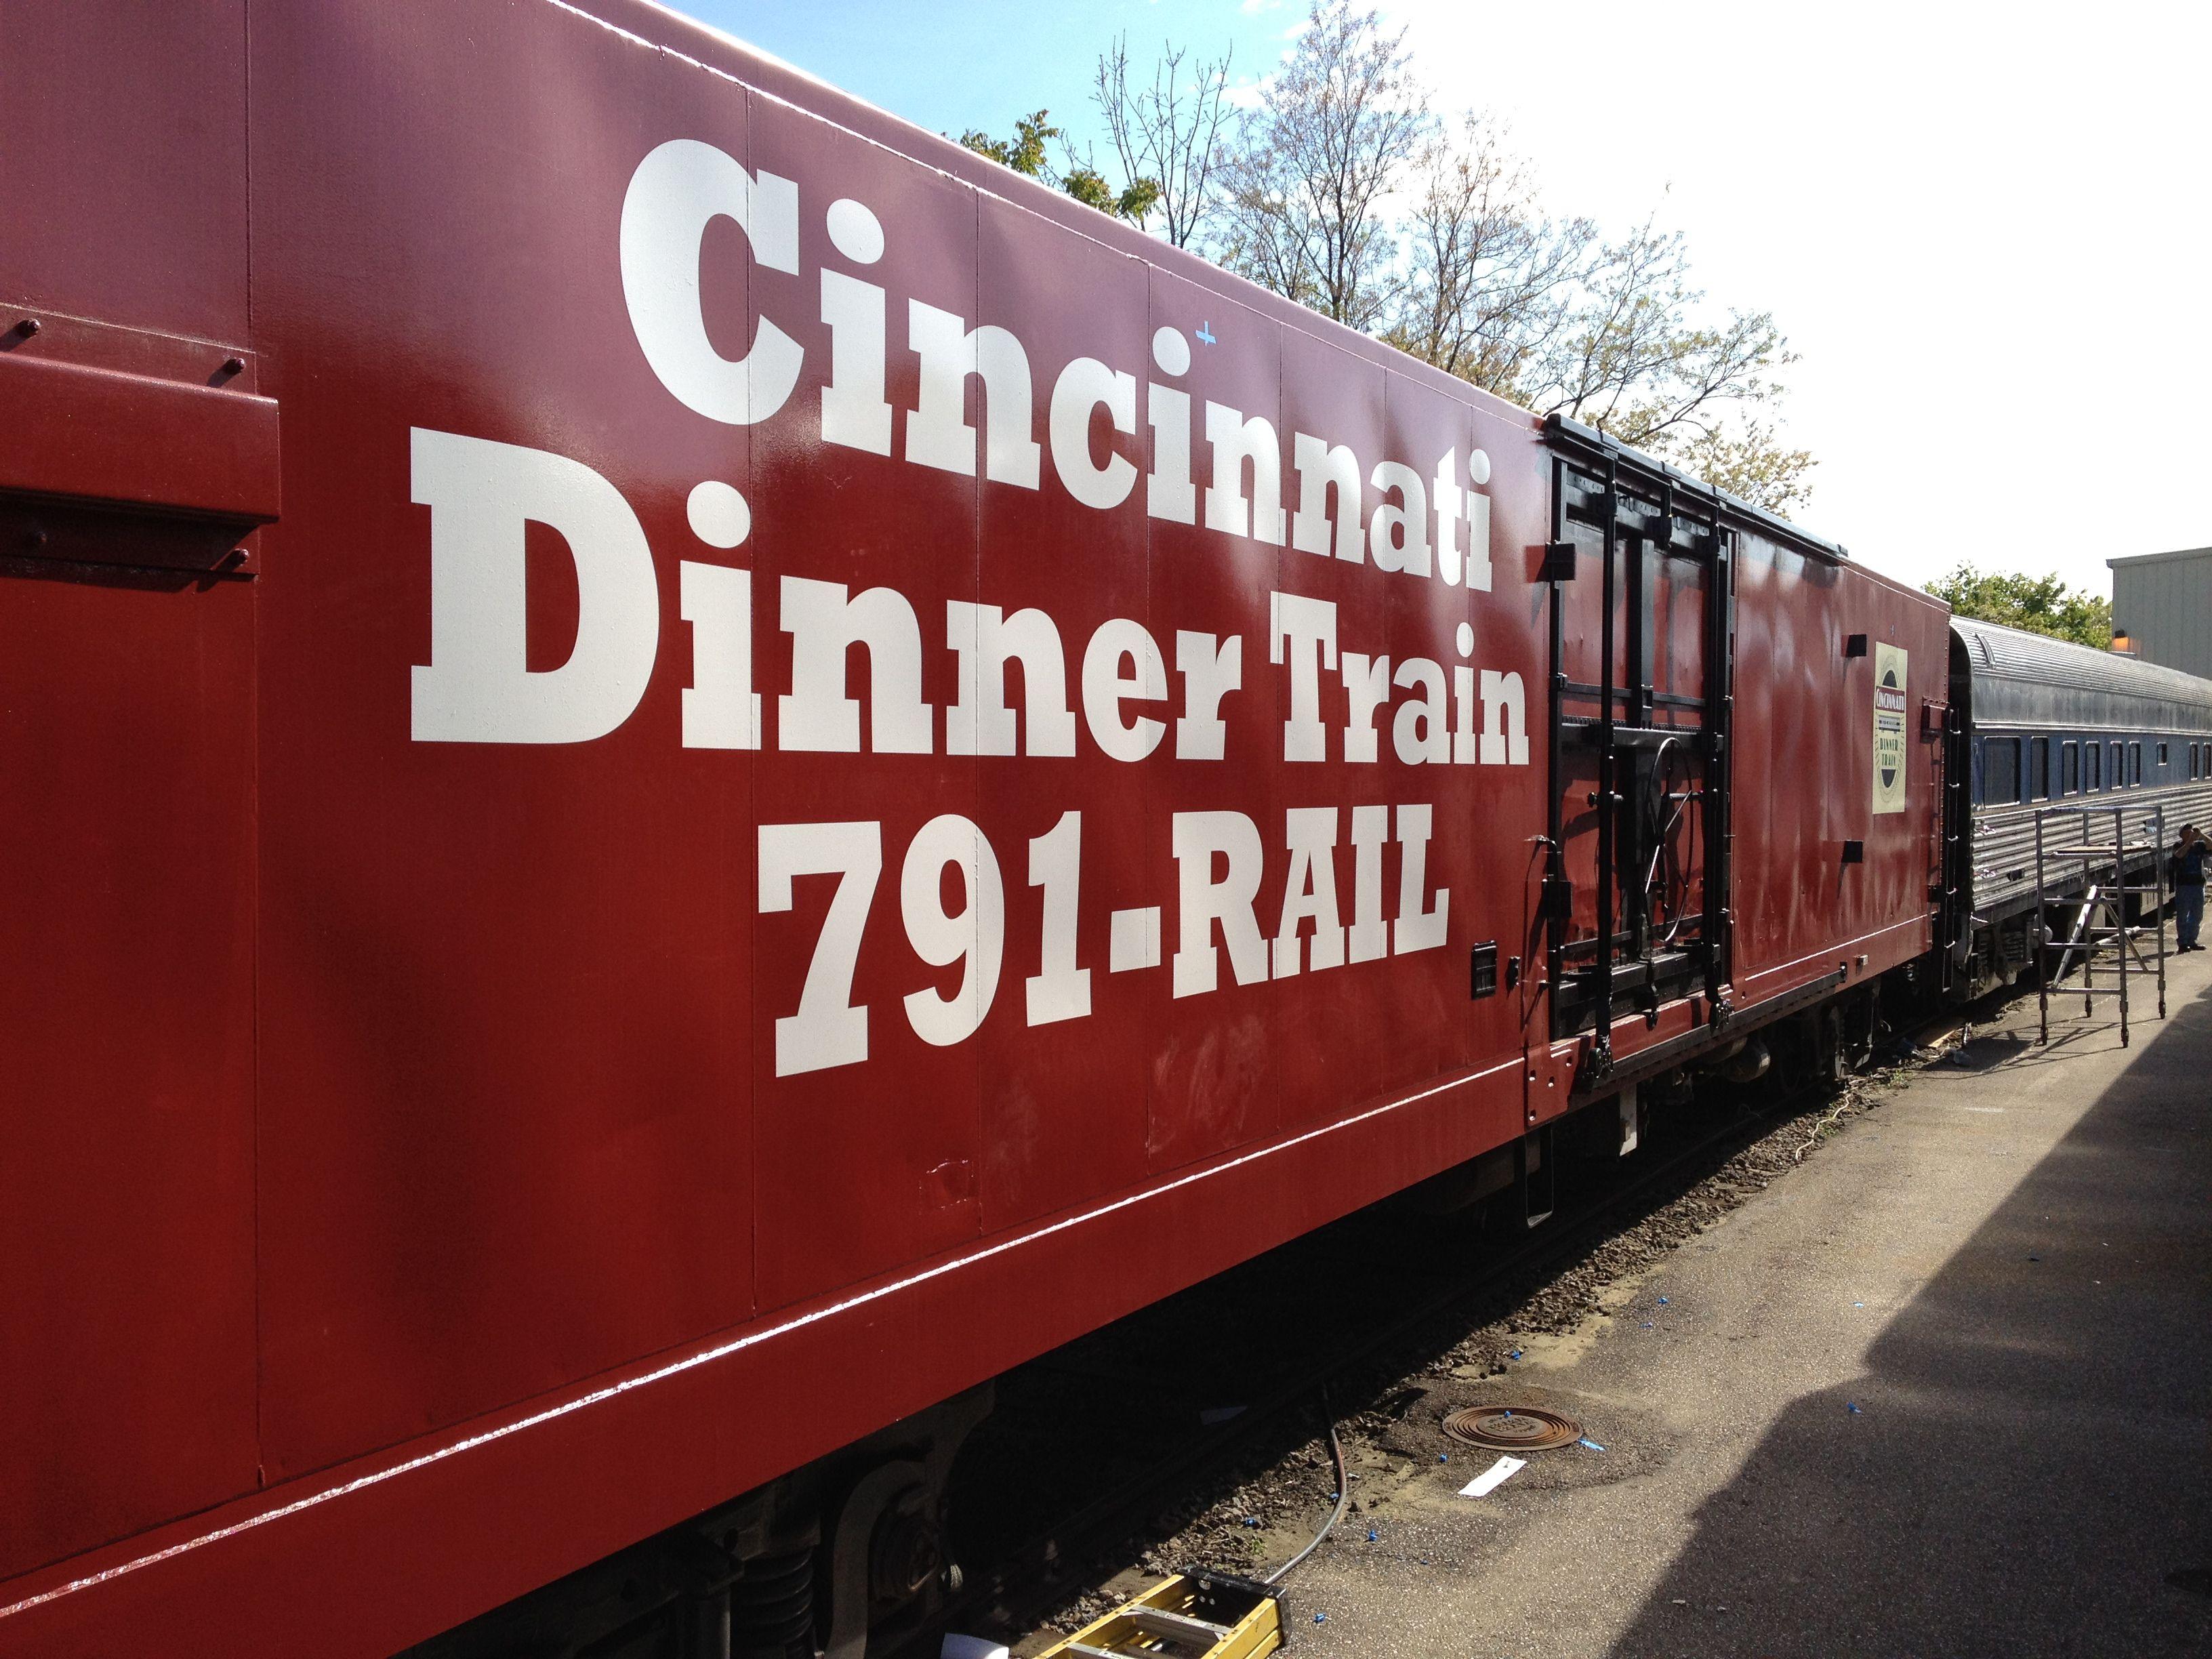 Cincinnati Dinner Train Power Car Cincinnati Dinner Train To Reserve Your Tickets Contact Us Via Email At Cdt Cincinnatira Dinner Train Train Cincinnati